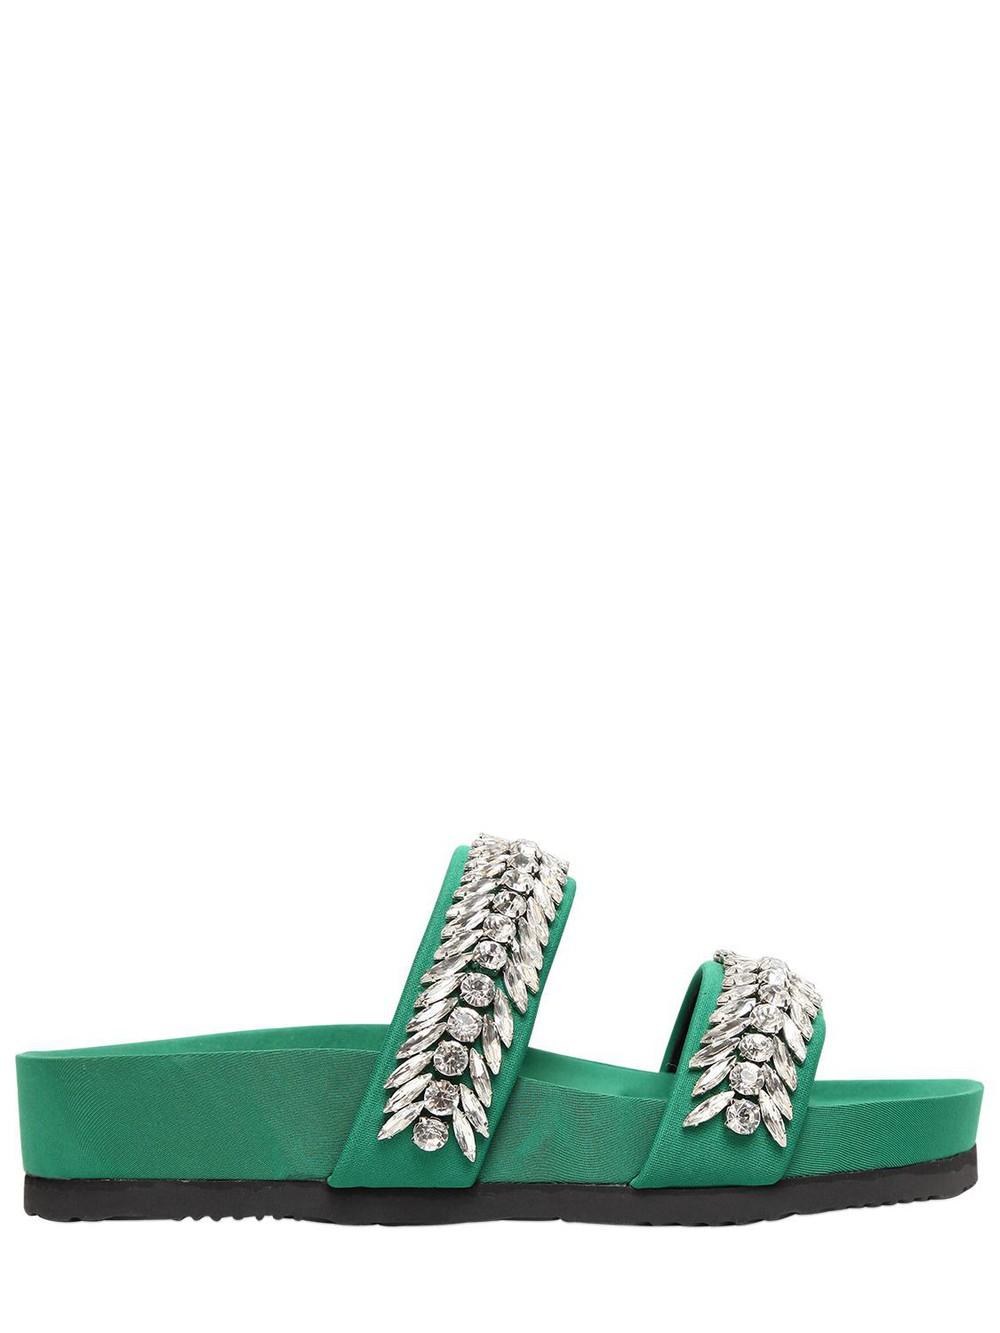 SUECOMMA BONNIE 20mm Embellished Neoprene Slide Flats in green